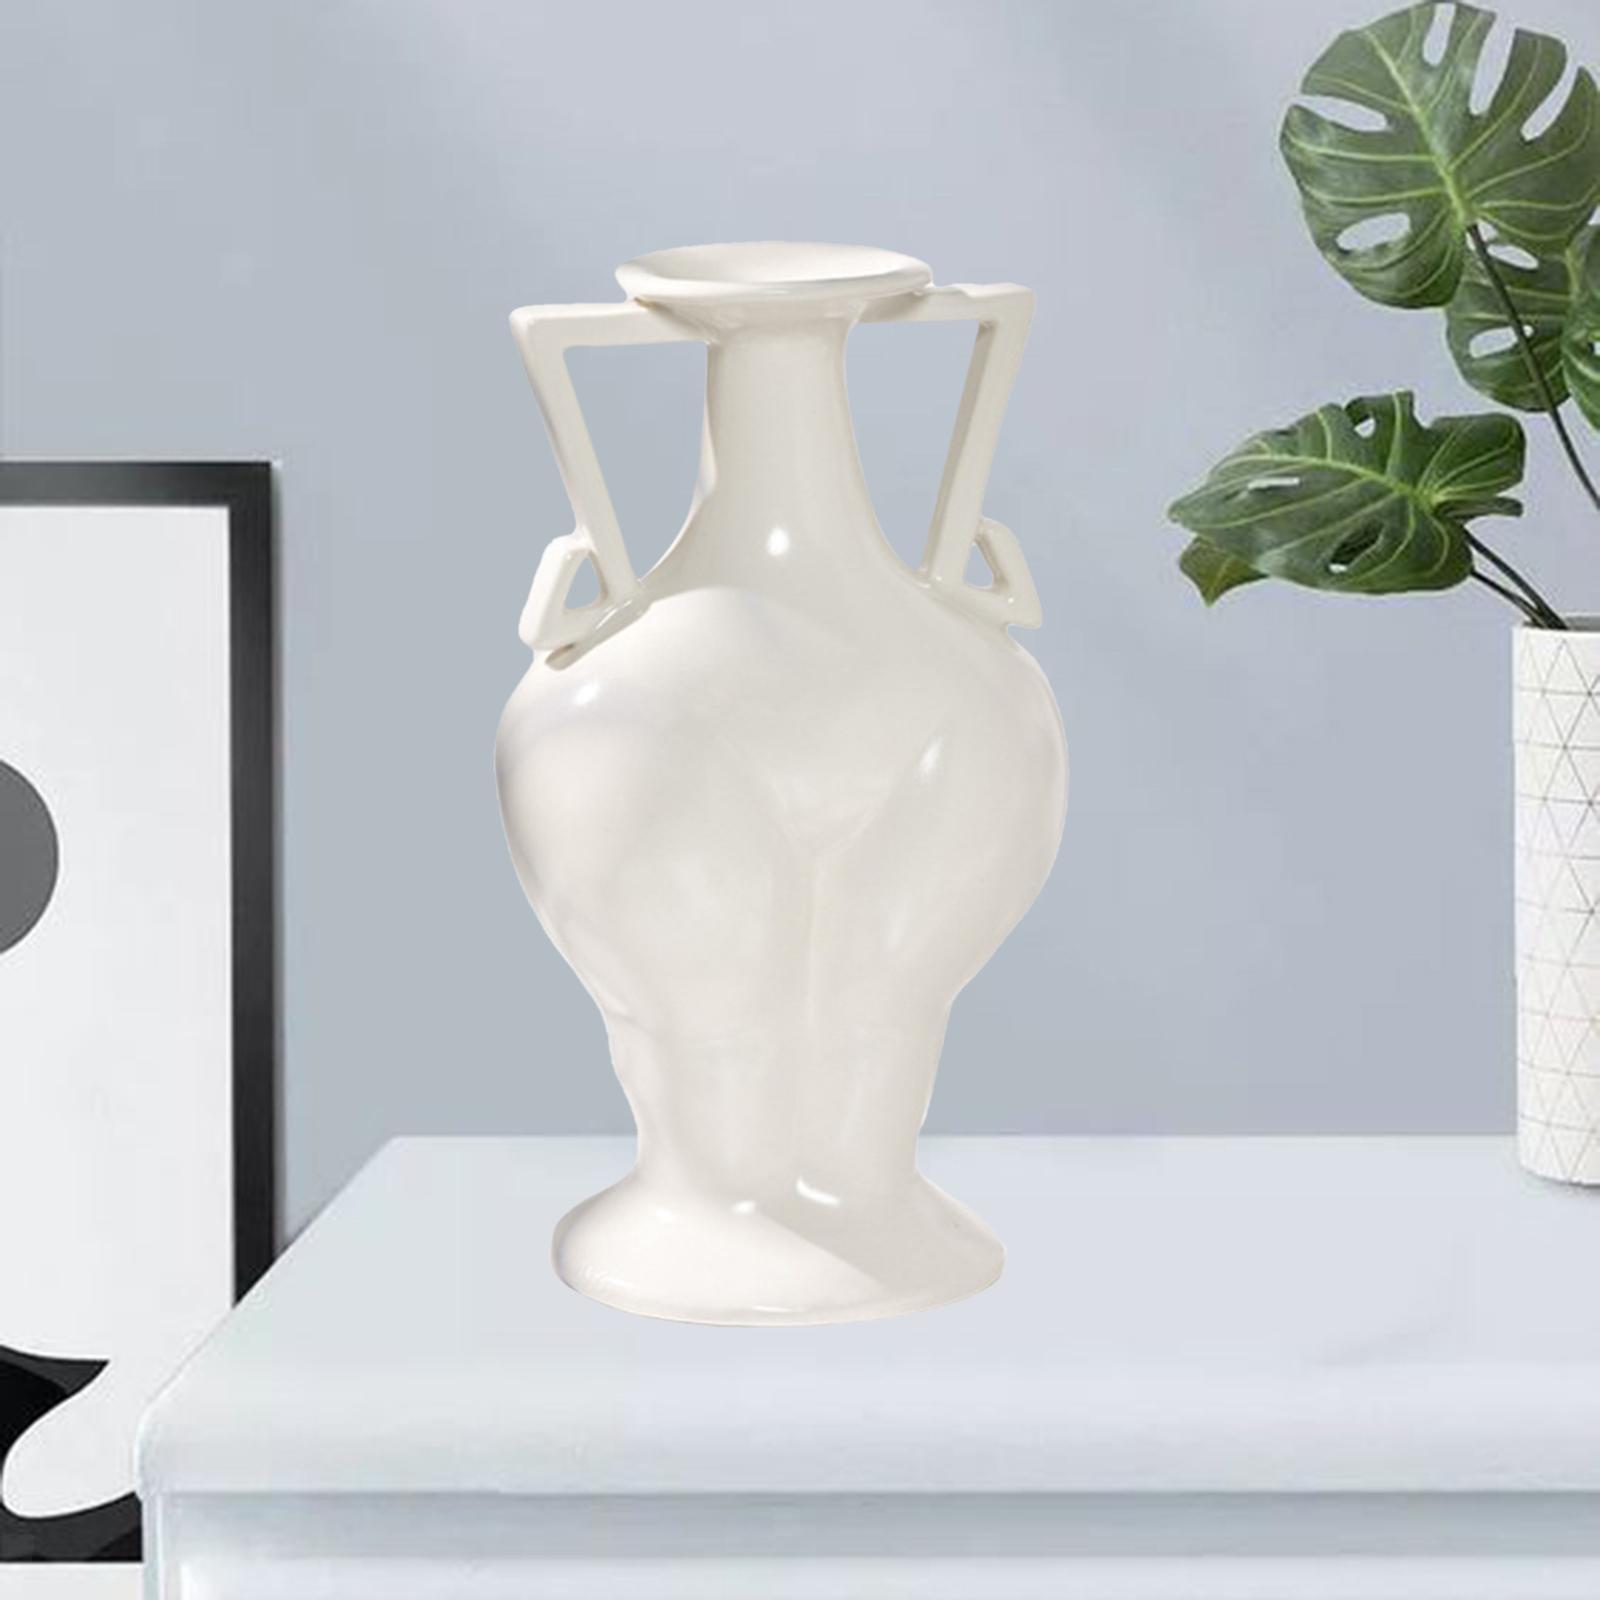 Indexbild 23 - Blumenvase Keramik Blumentöpfe Trockenblumenhalter Pflanzenvasen Wohnkultur